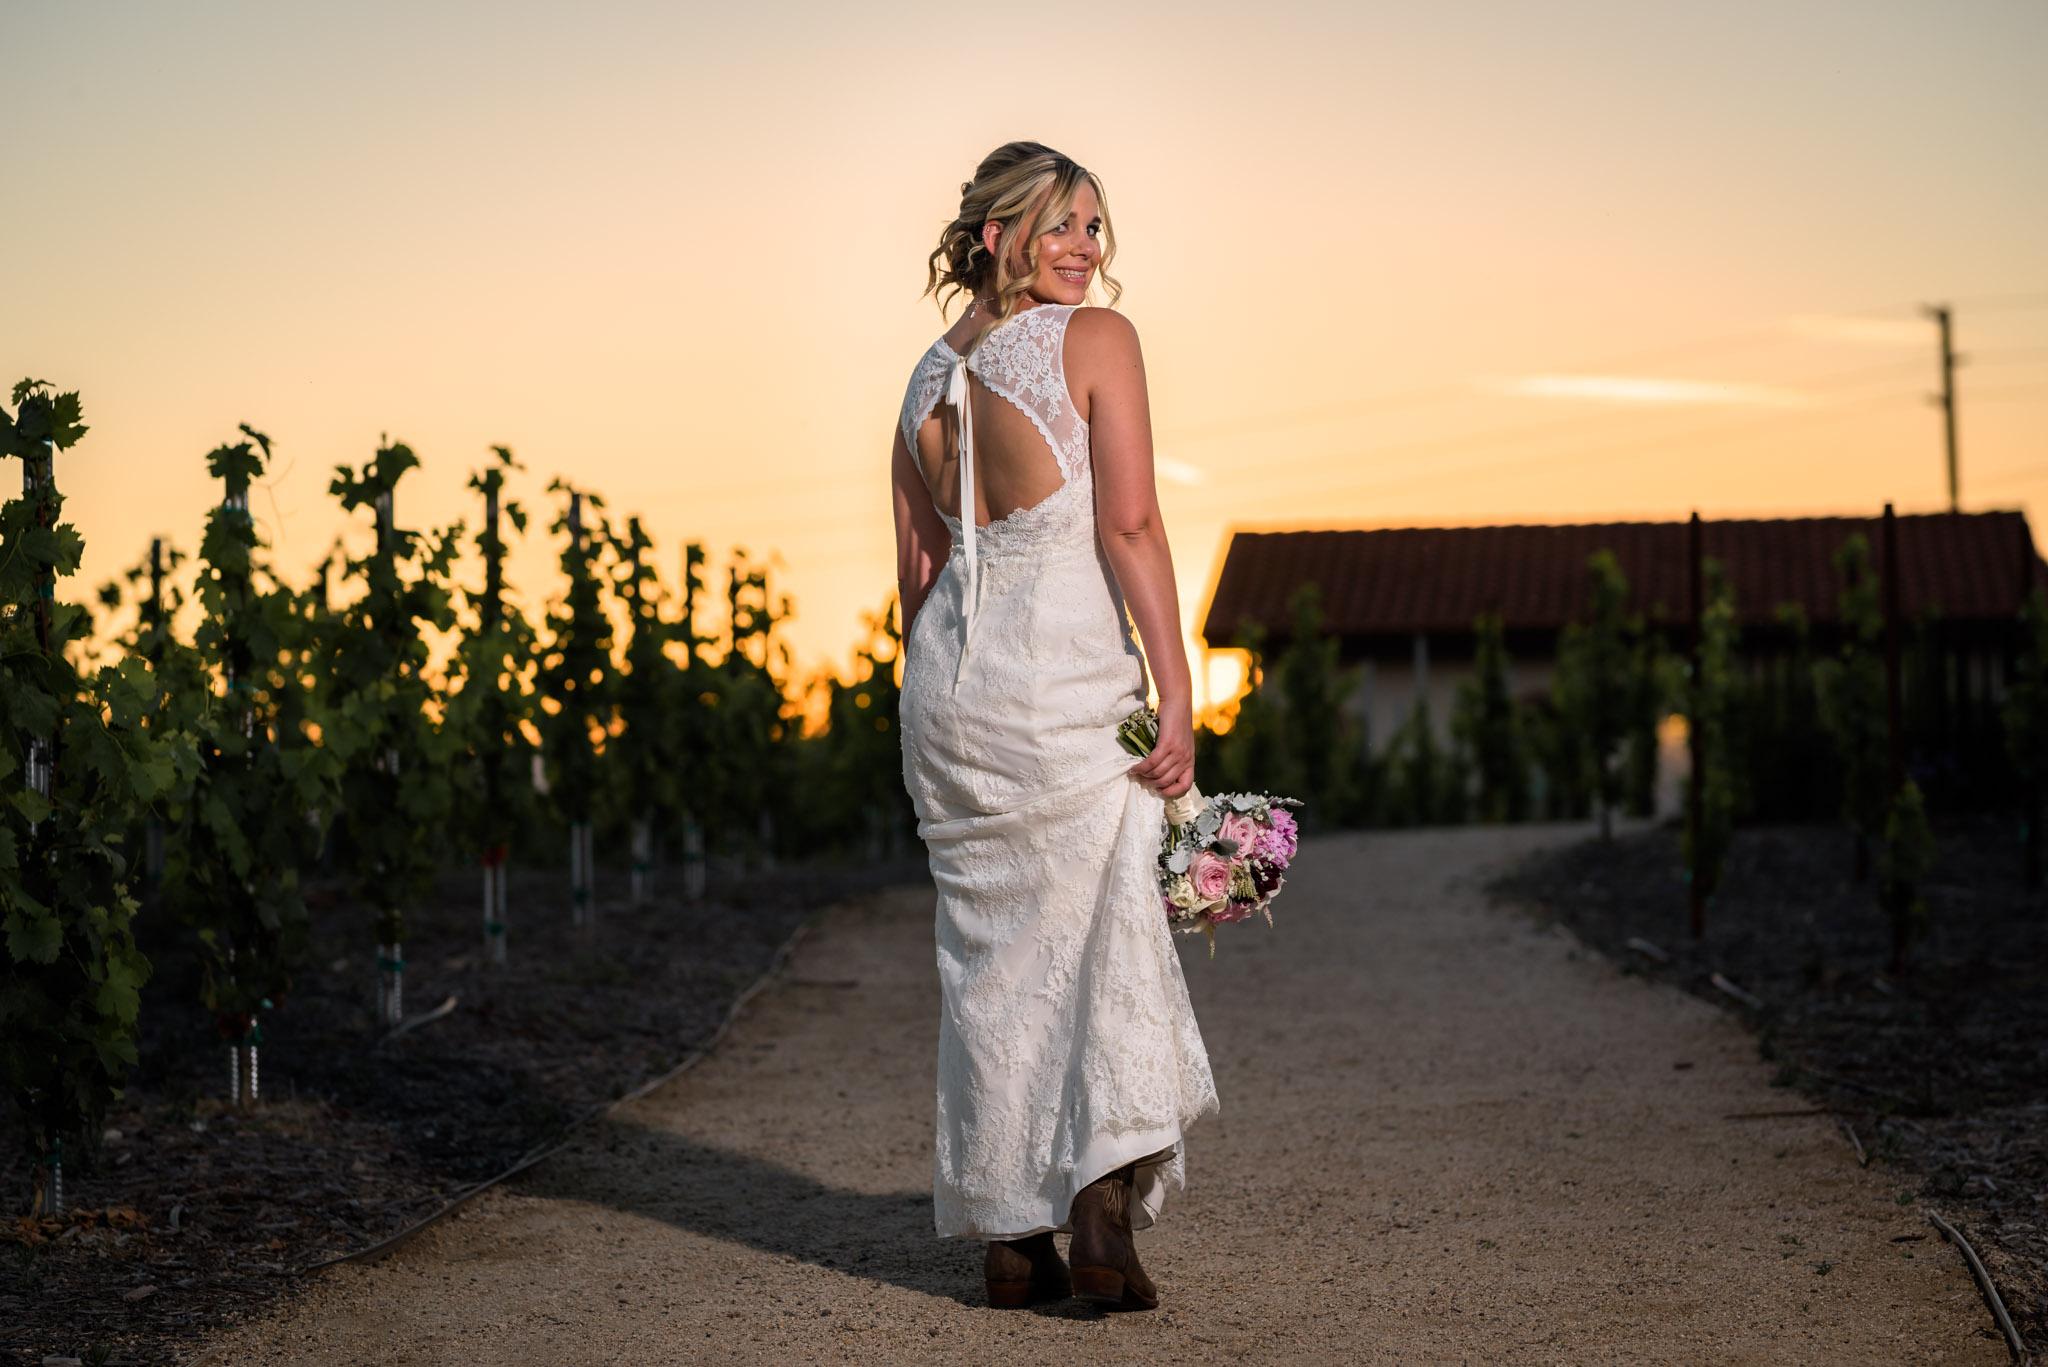 Avensole-Winery-Temecula-Wedding-Josh-and-Olivia-3833.JPG